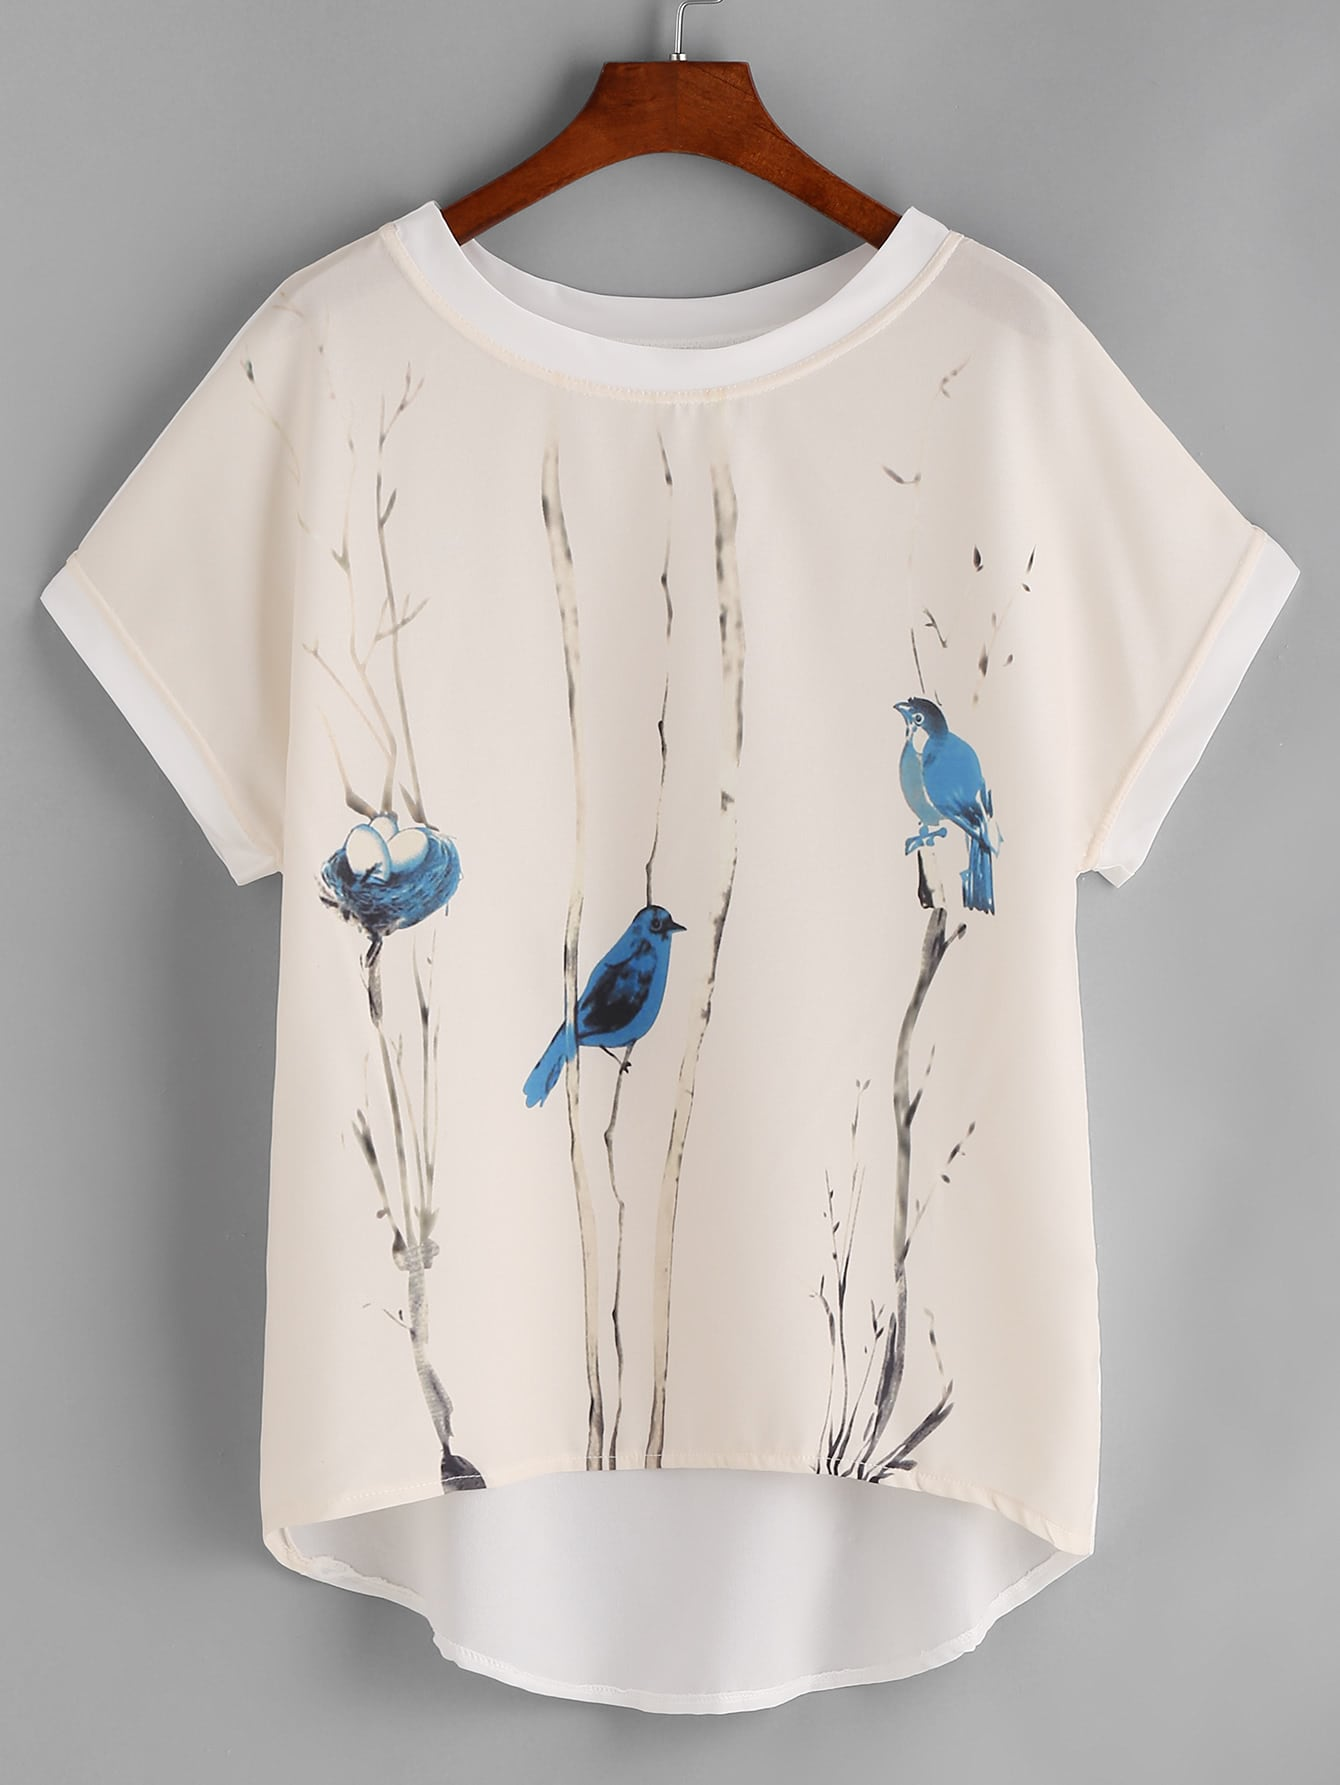 Graphic Print Contrast Trim Dip Hem Chiffon Top blouse170328103